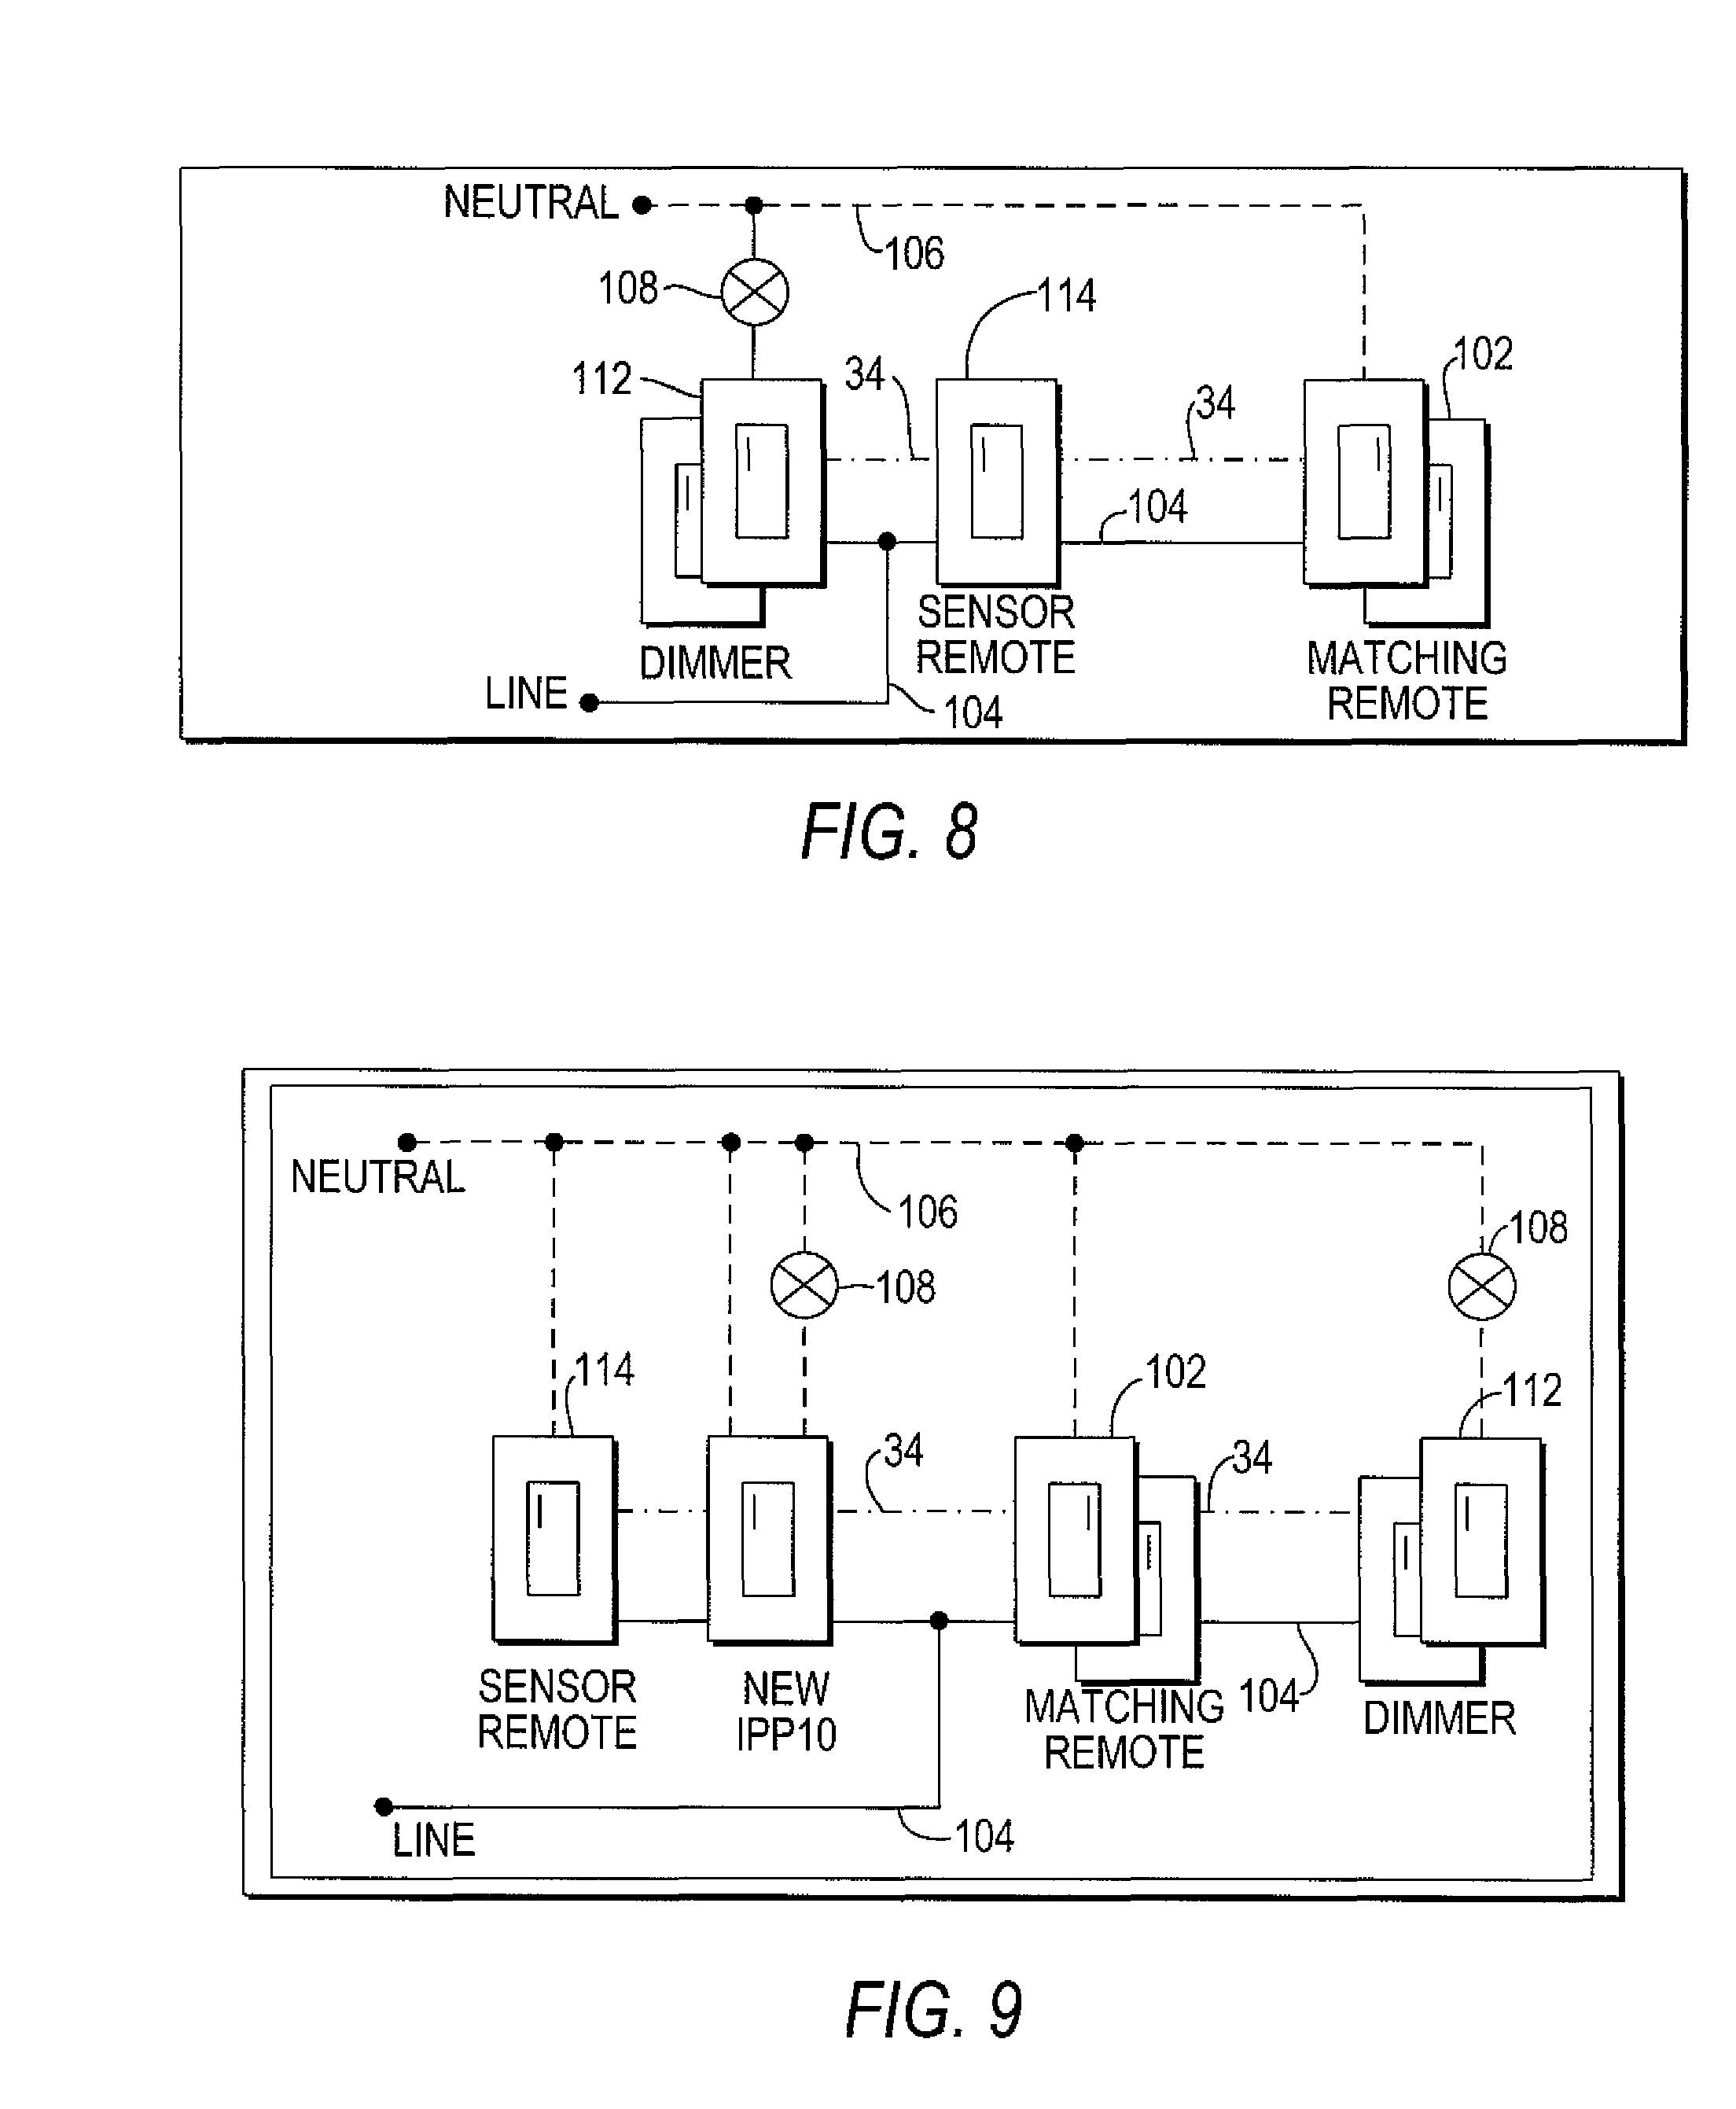 Lutron Dimmer Switch Wiring Diagram: Lutron Dimming Ballast Wiring Diagram